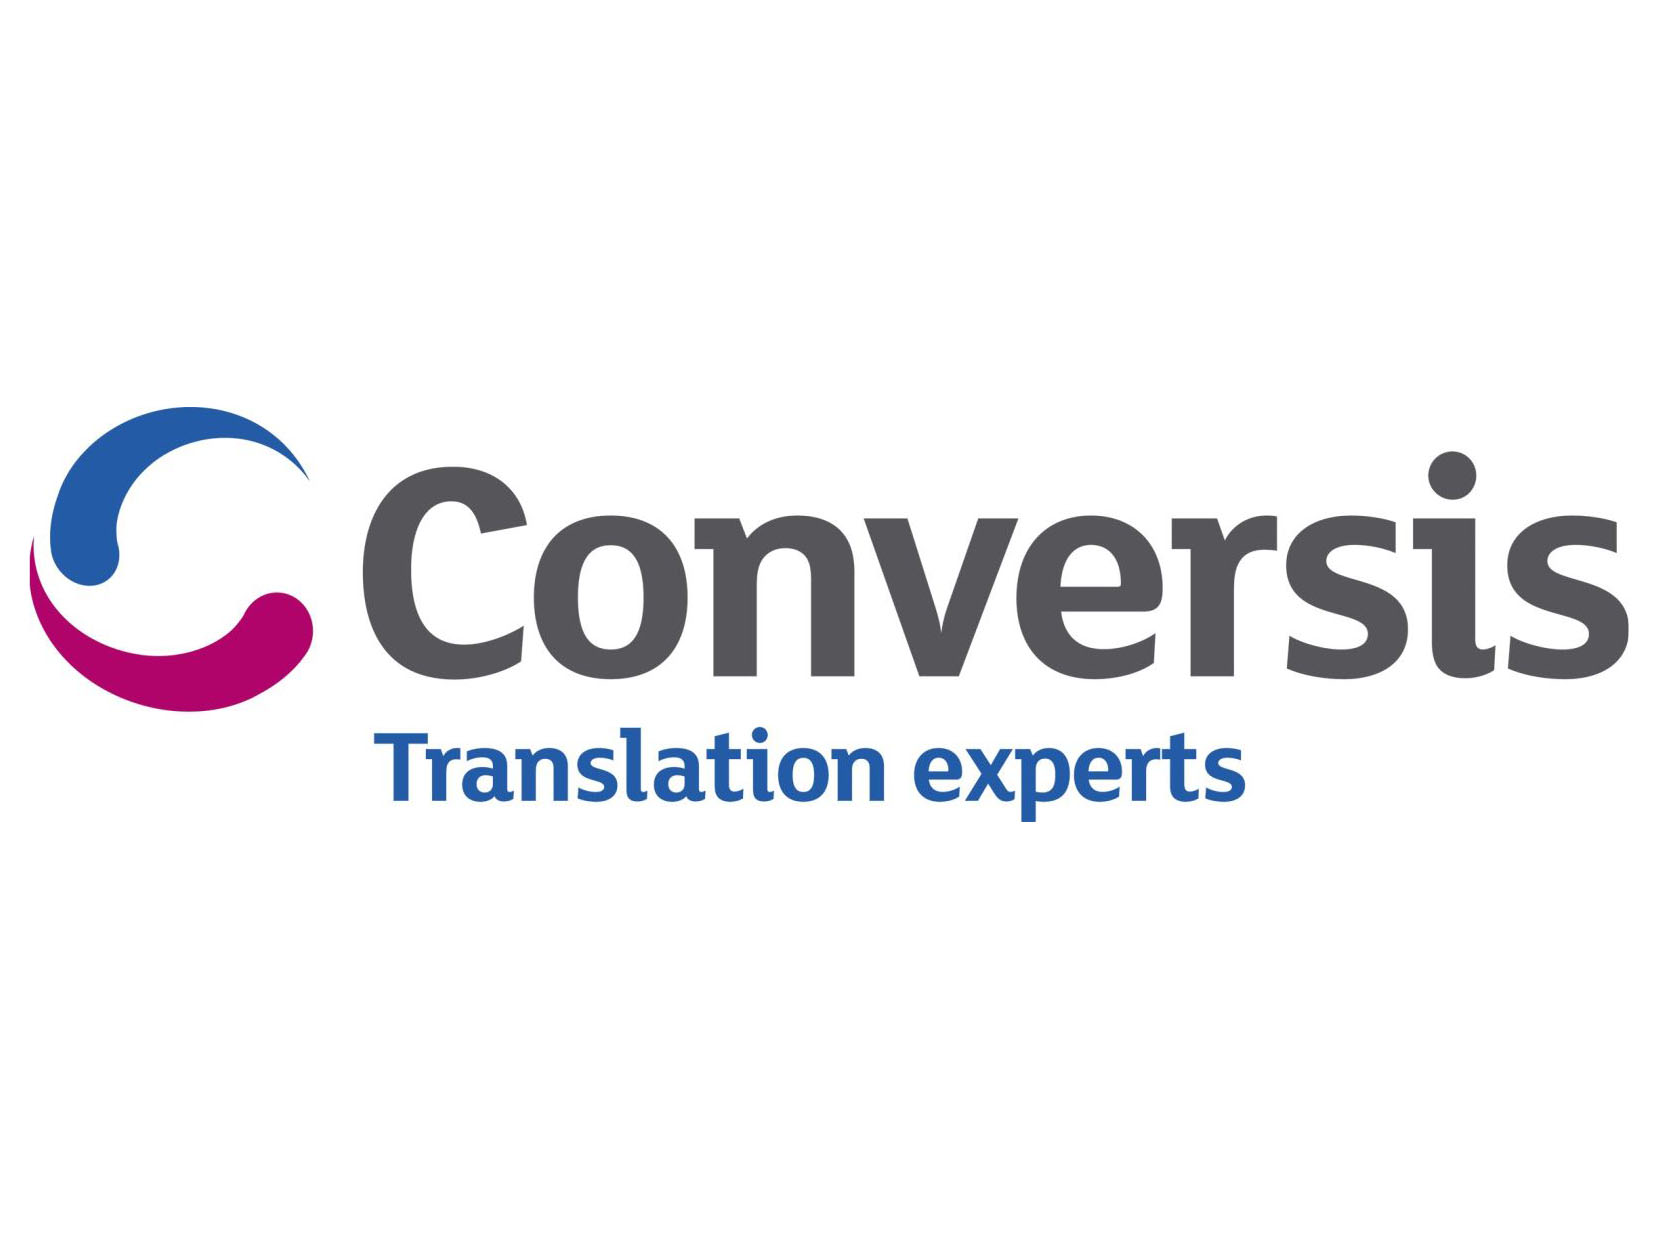 Conversis